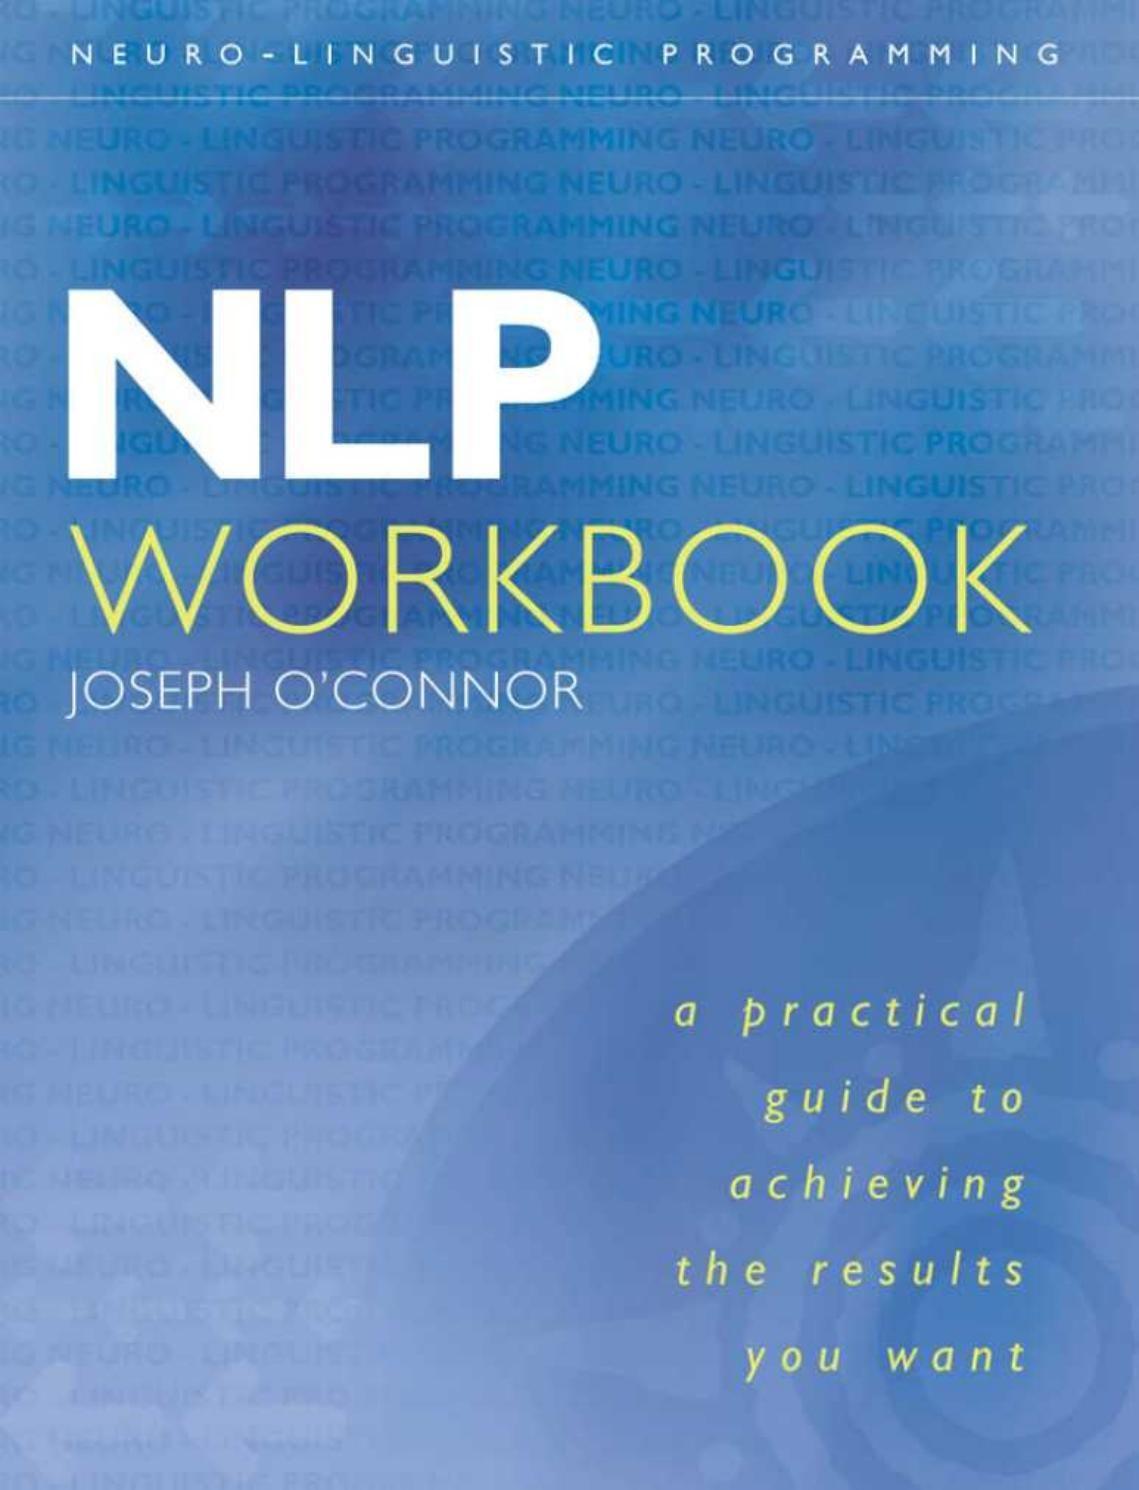 Nlp workbook joseph o'connor (neuro linguistic programming ...